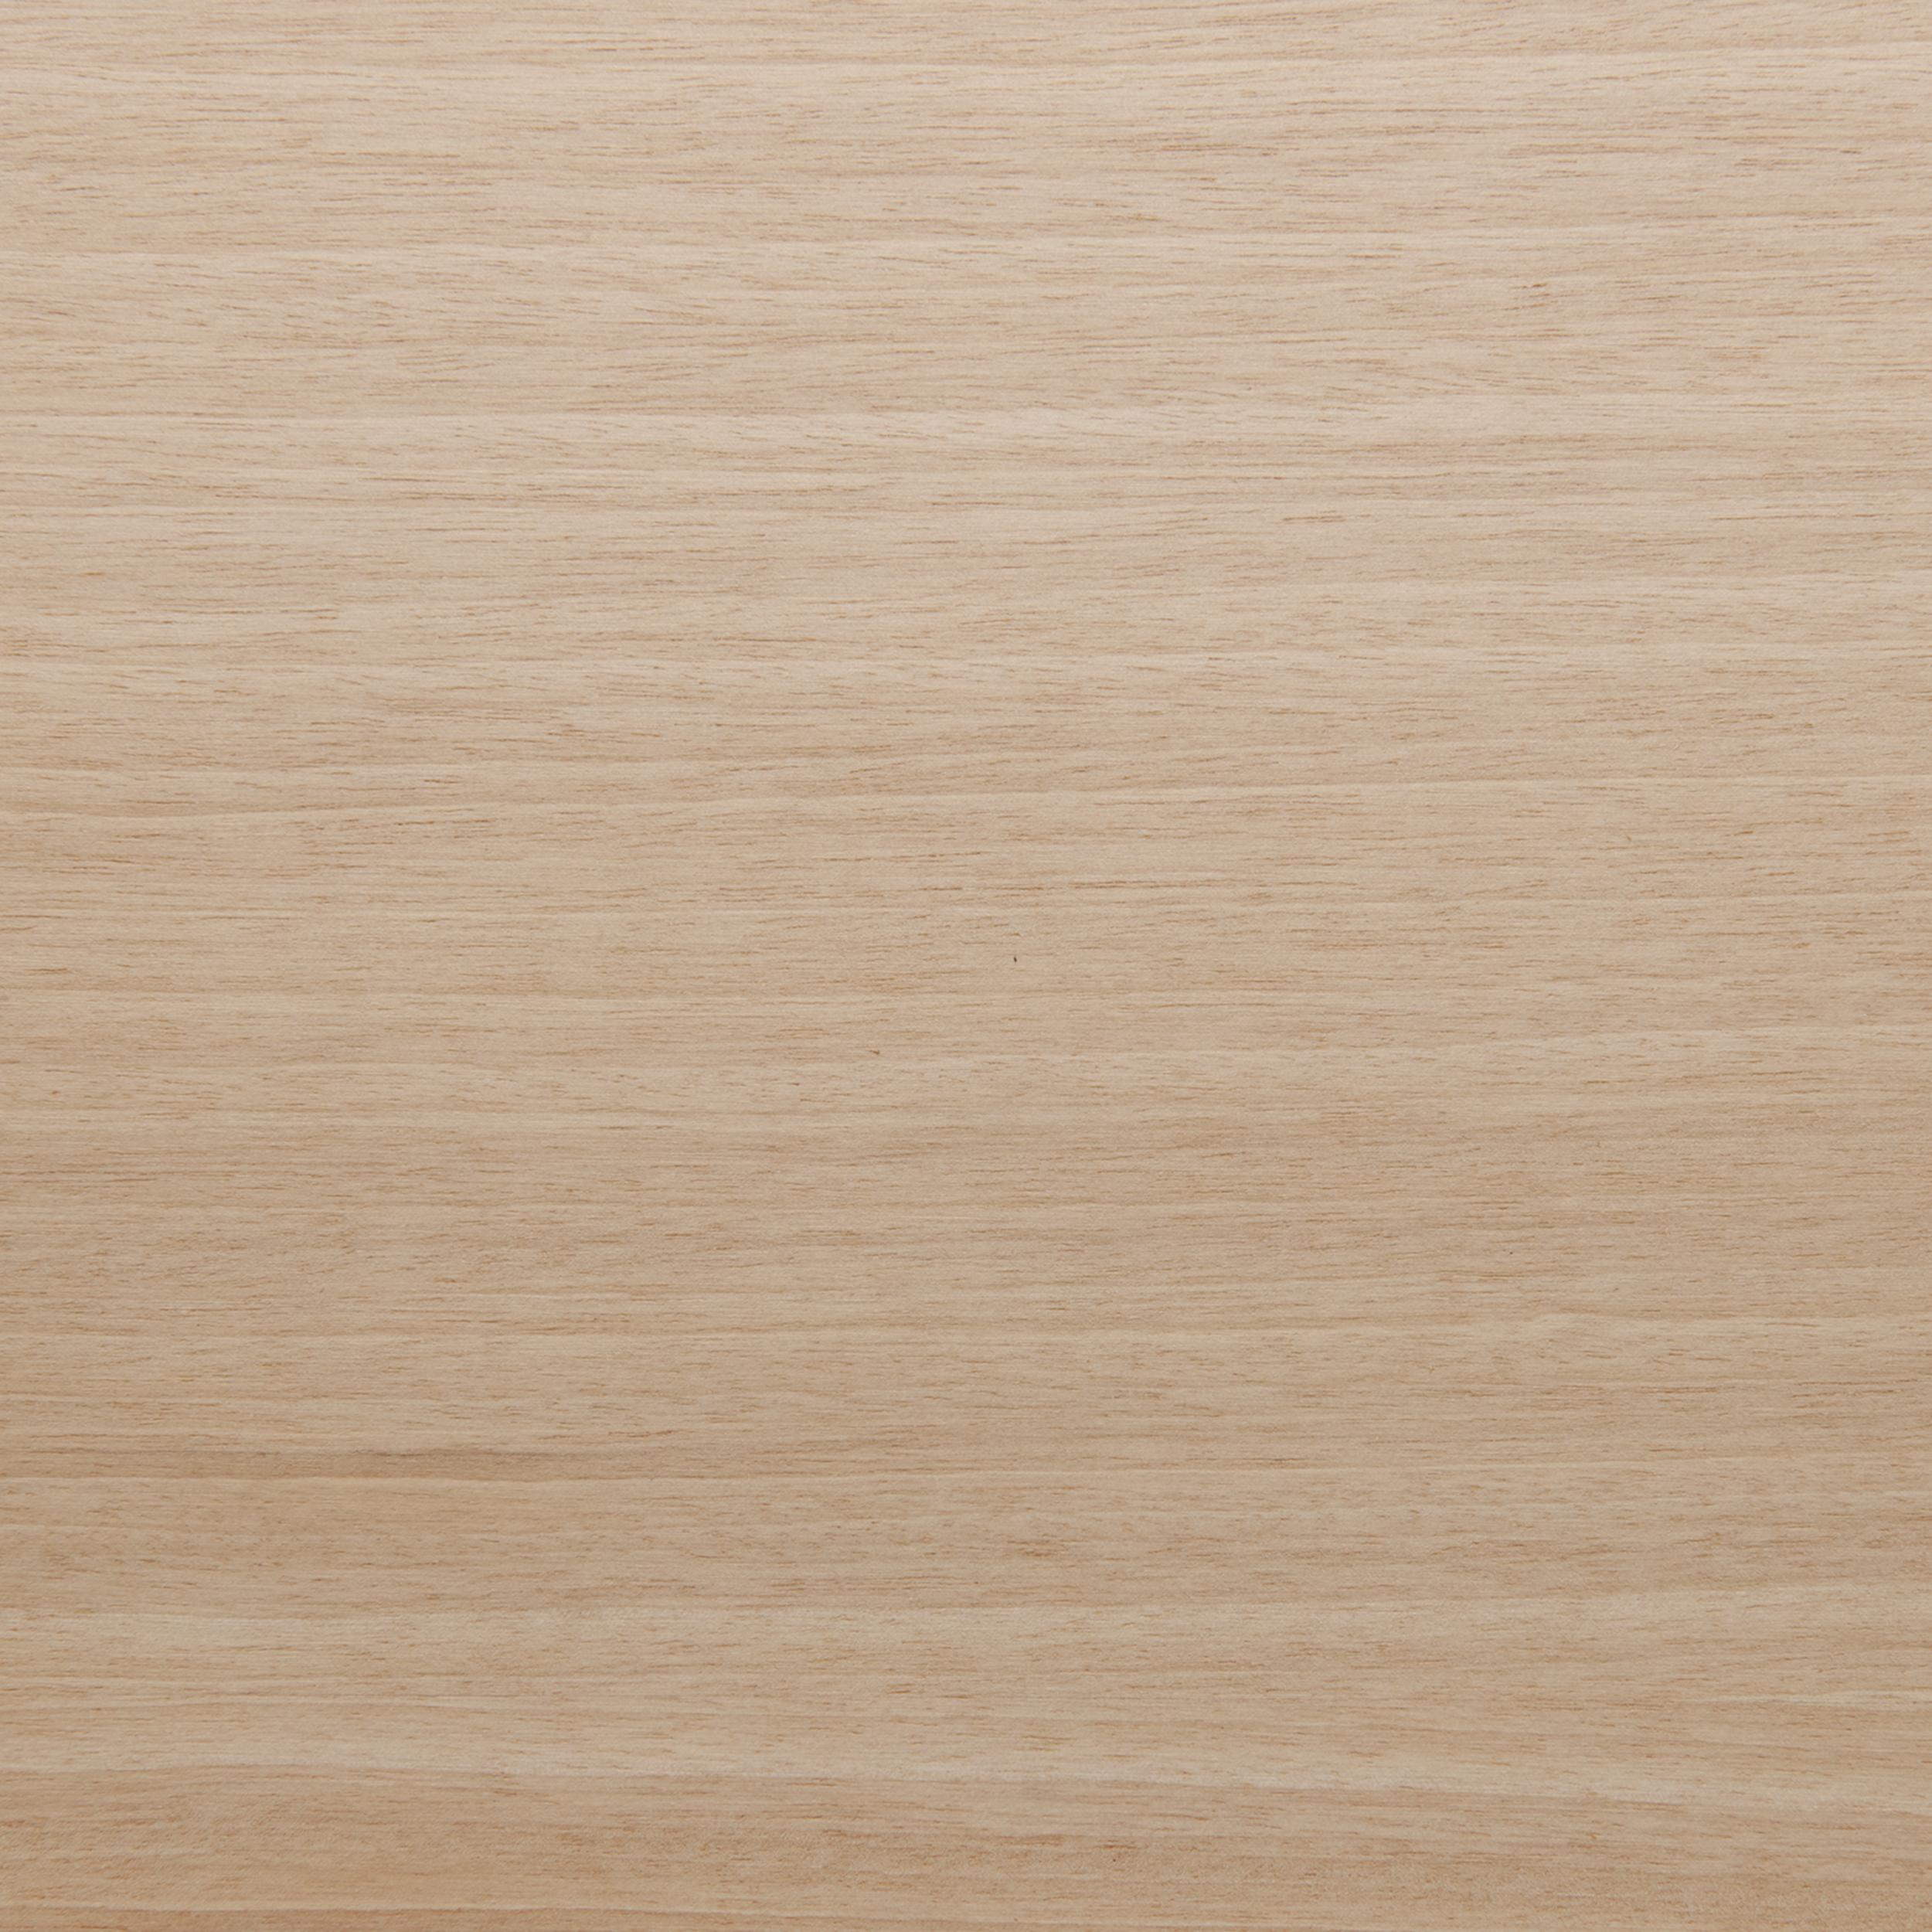 Anigre Veneer Sheet Quarter Cut 4' x 8' 2-Ply Wood on Wood